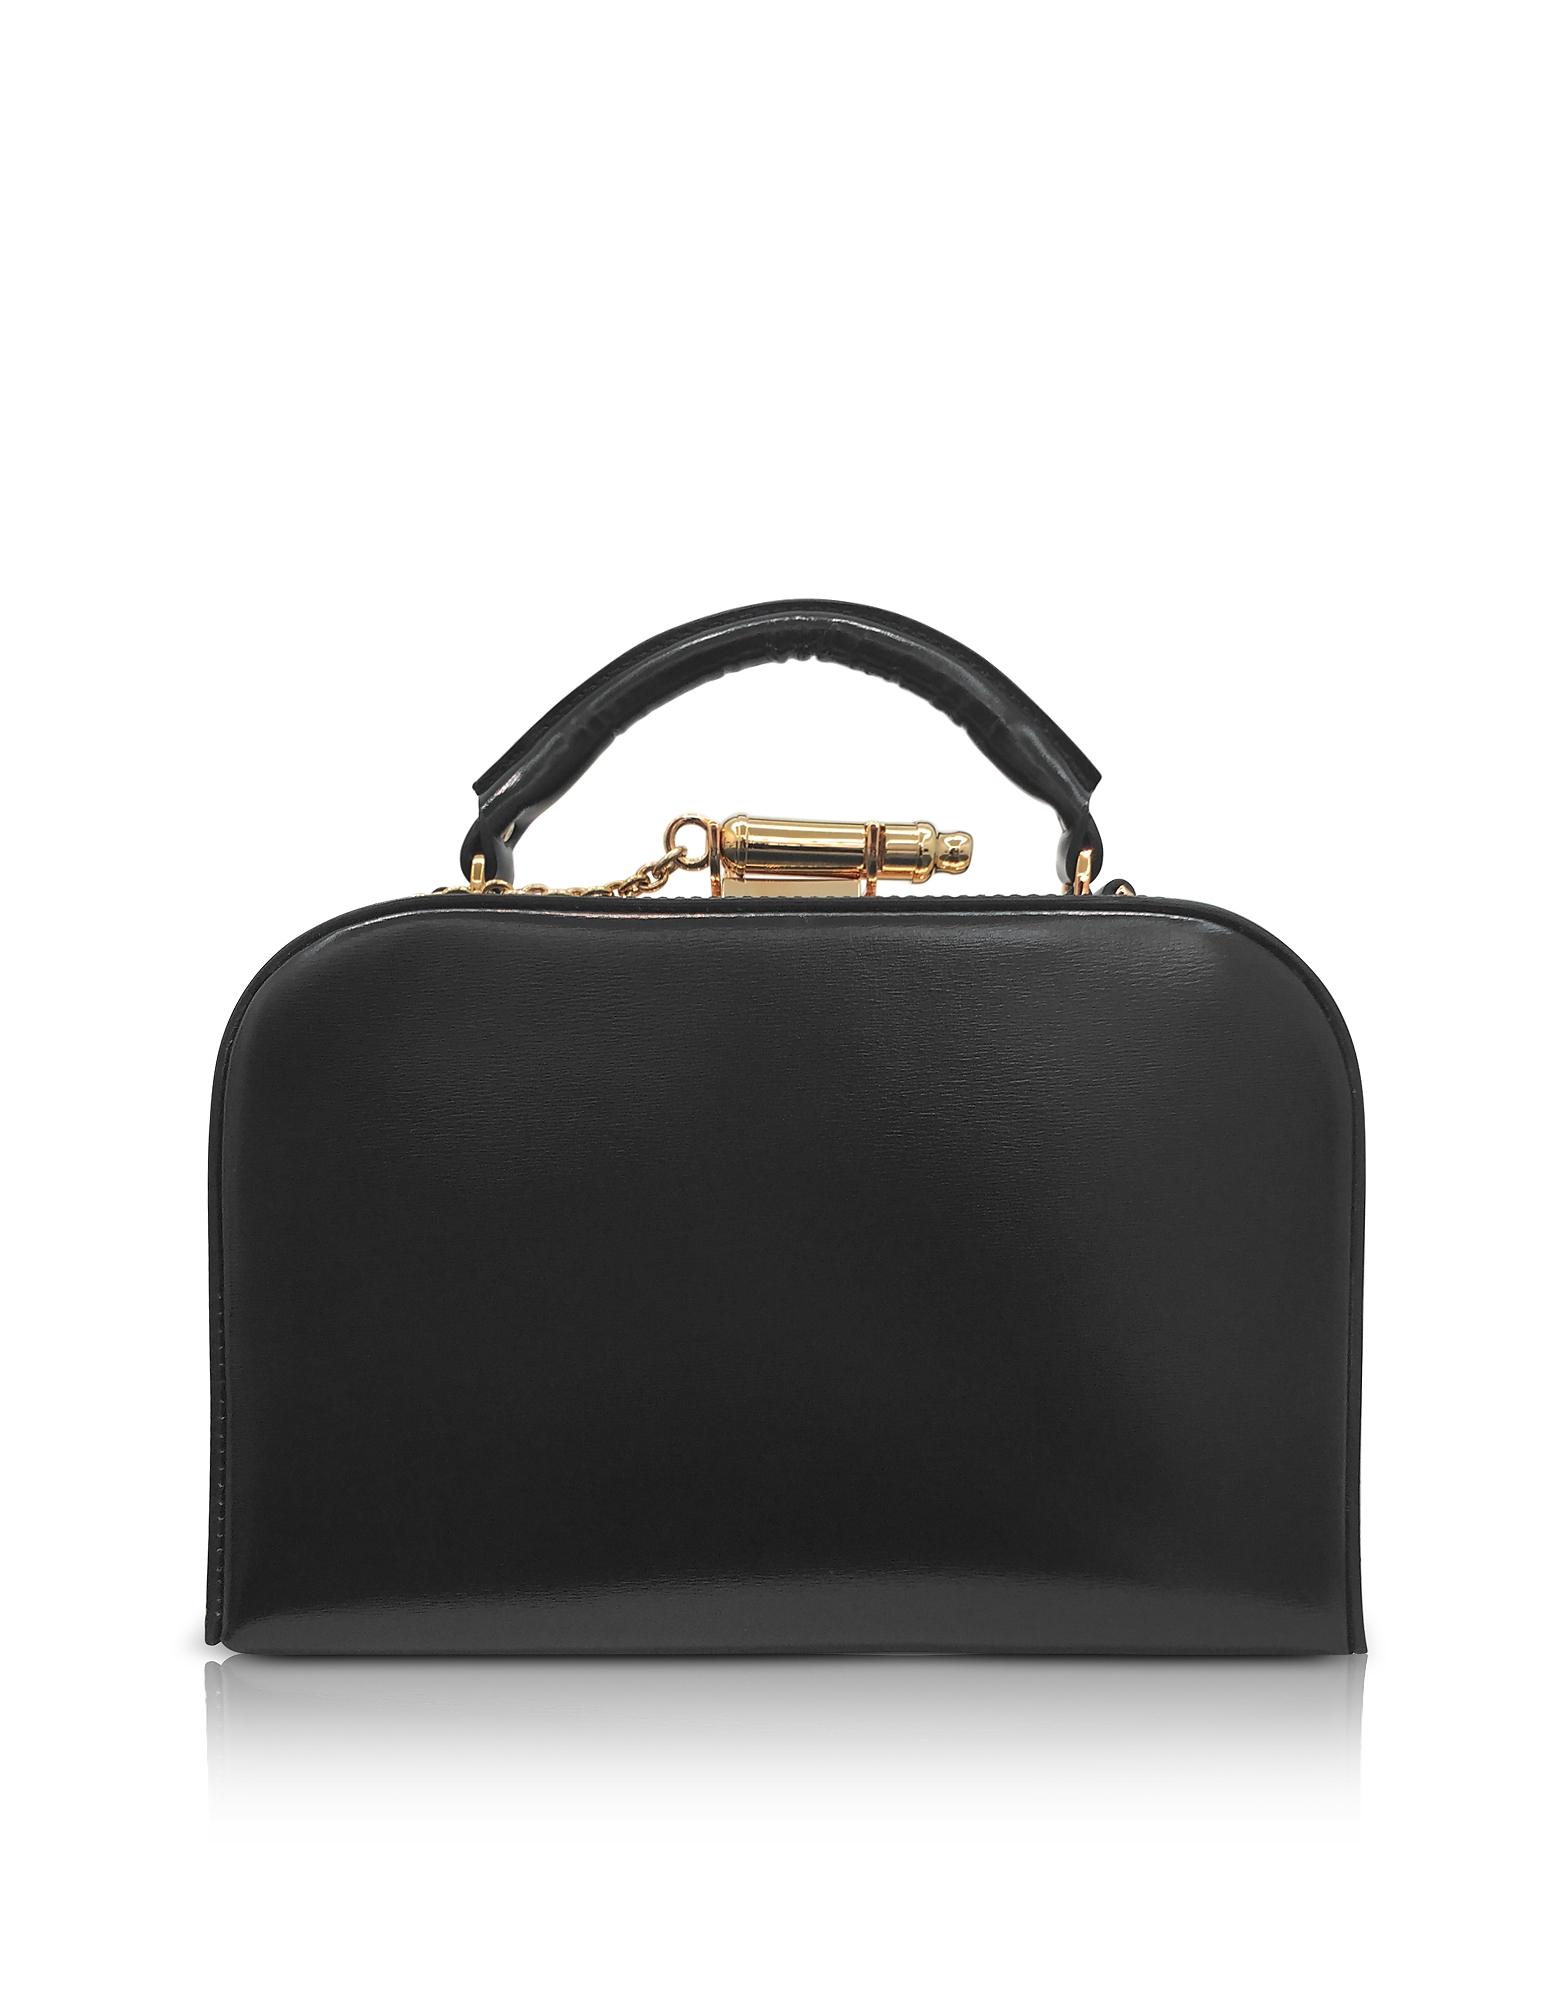 Sophie Hulme Handbags, Black Leather Whistle Case Bag